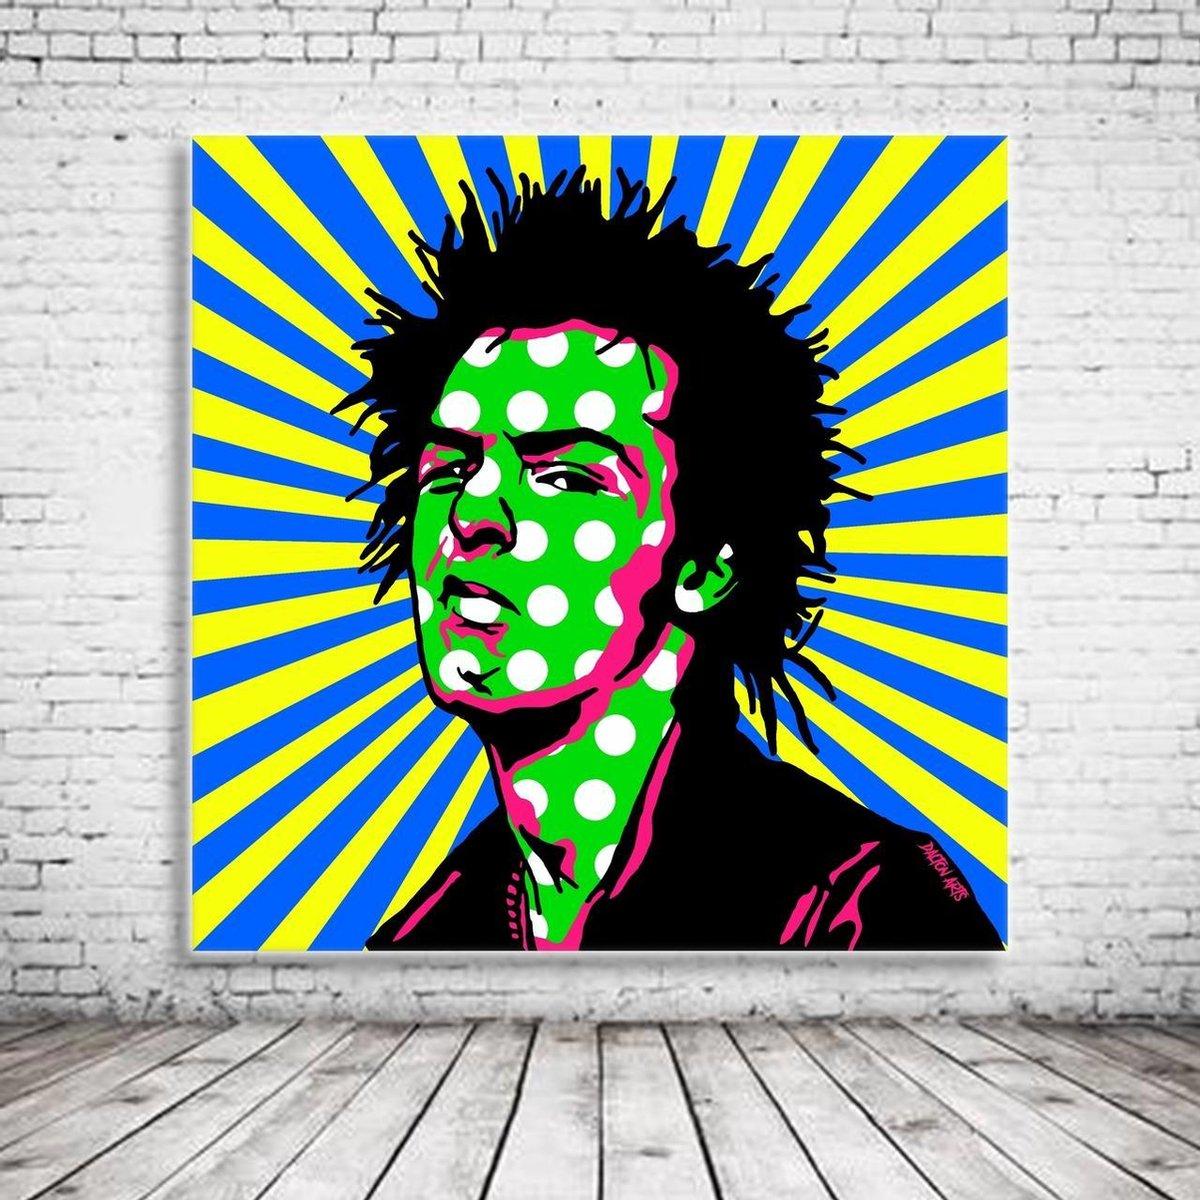 Pop Art Sid Vicious Canvas - 100 x 100 cm - Canvasprint - Op dennenhouten kader - Geprint Schilderij - Popart Wanddecoratie